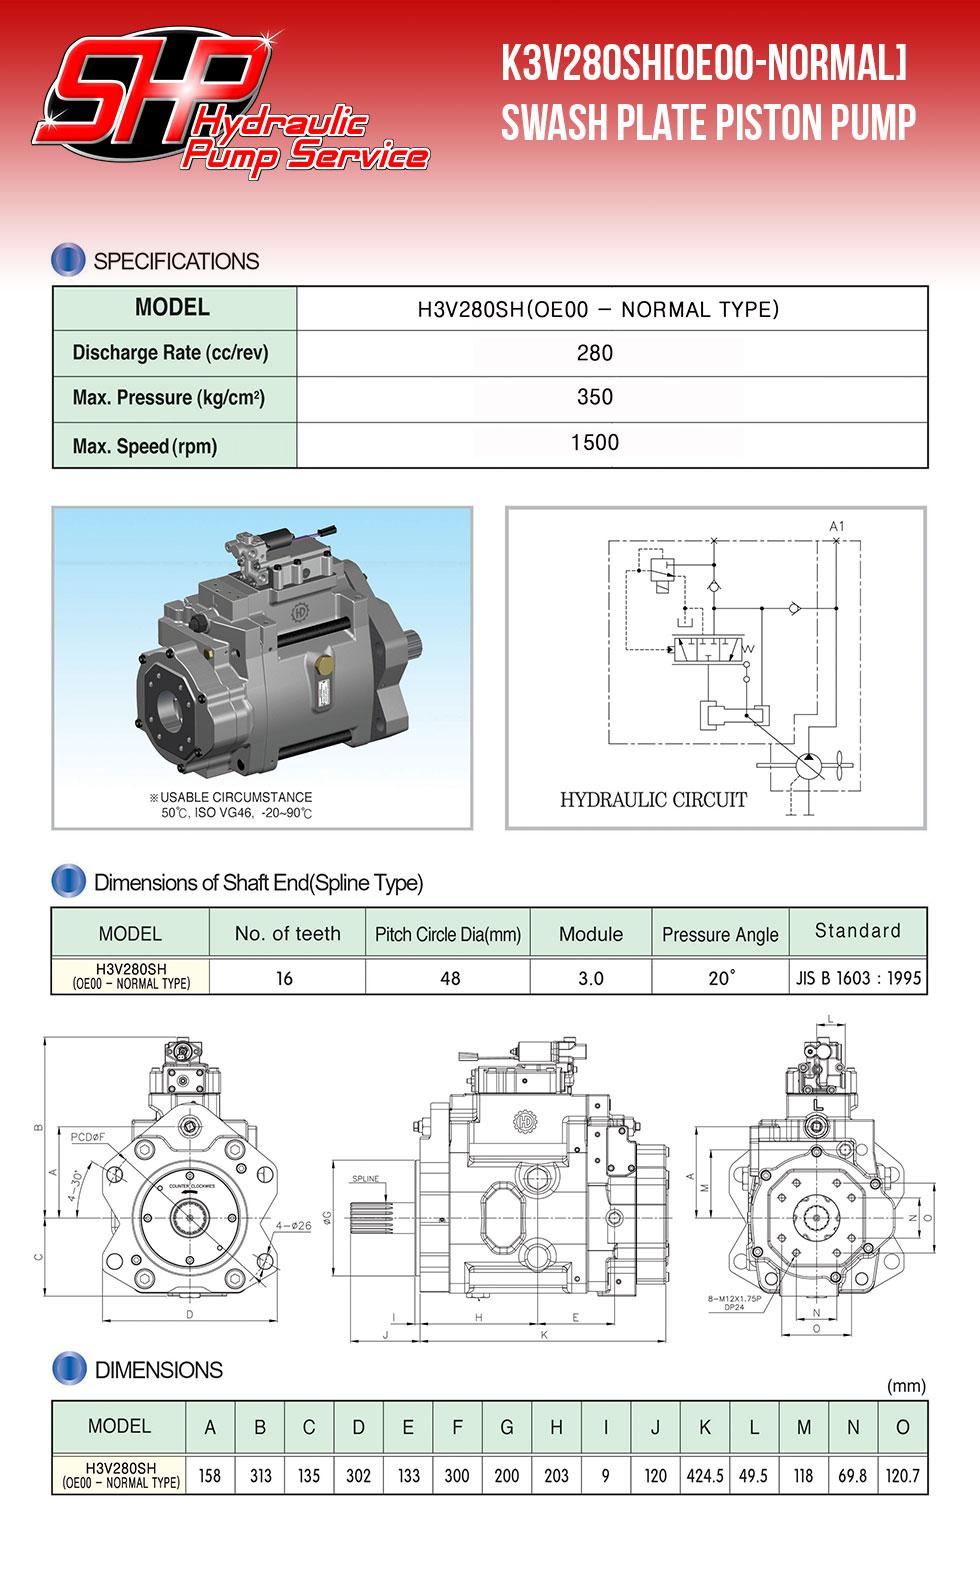 K3V280SH[OE00-Normal] Swash Plate Piston Pump